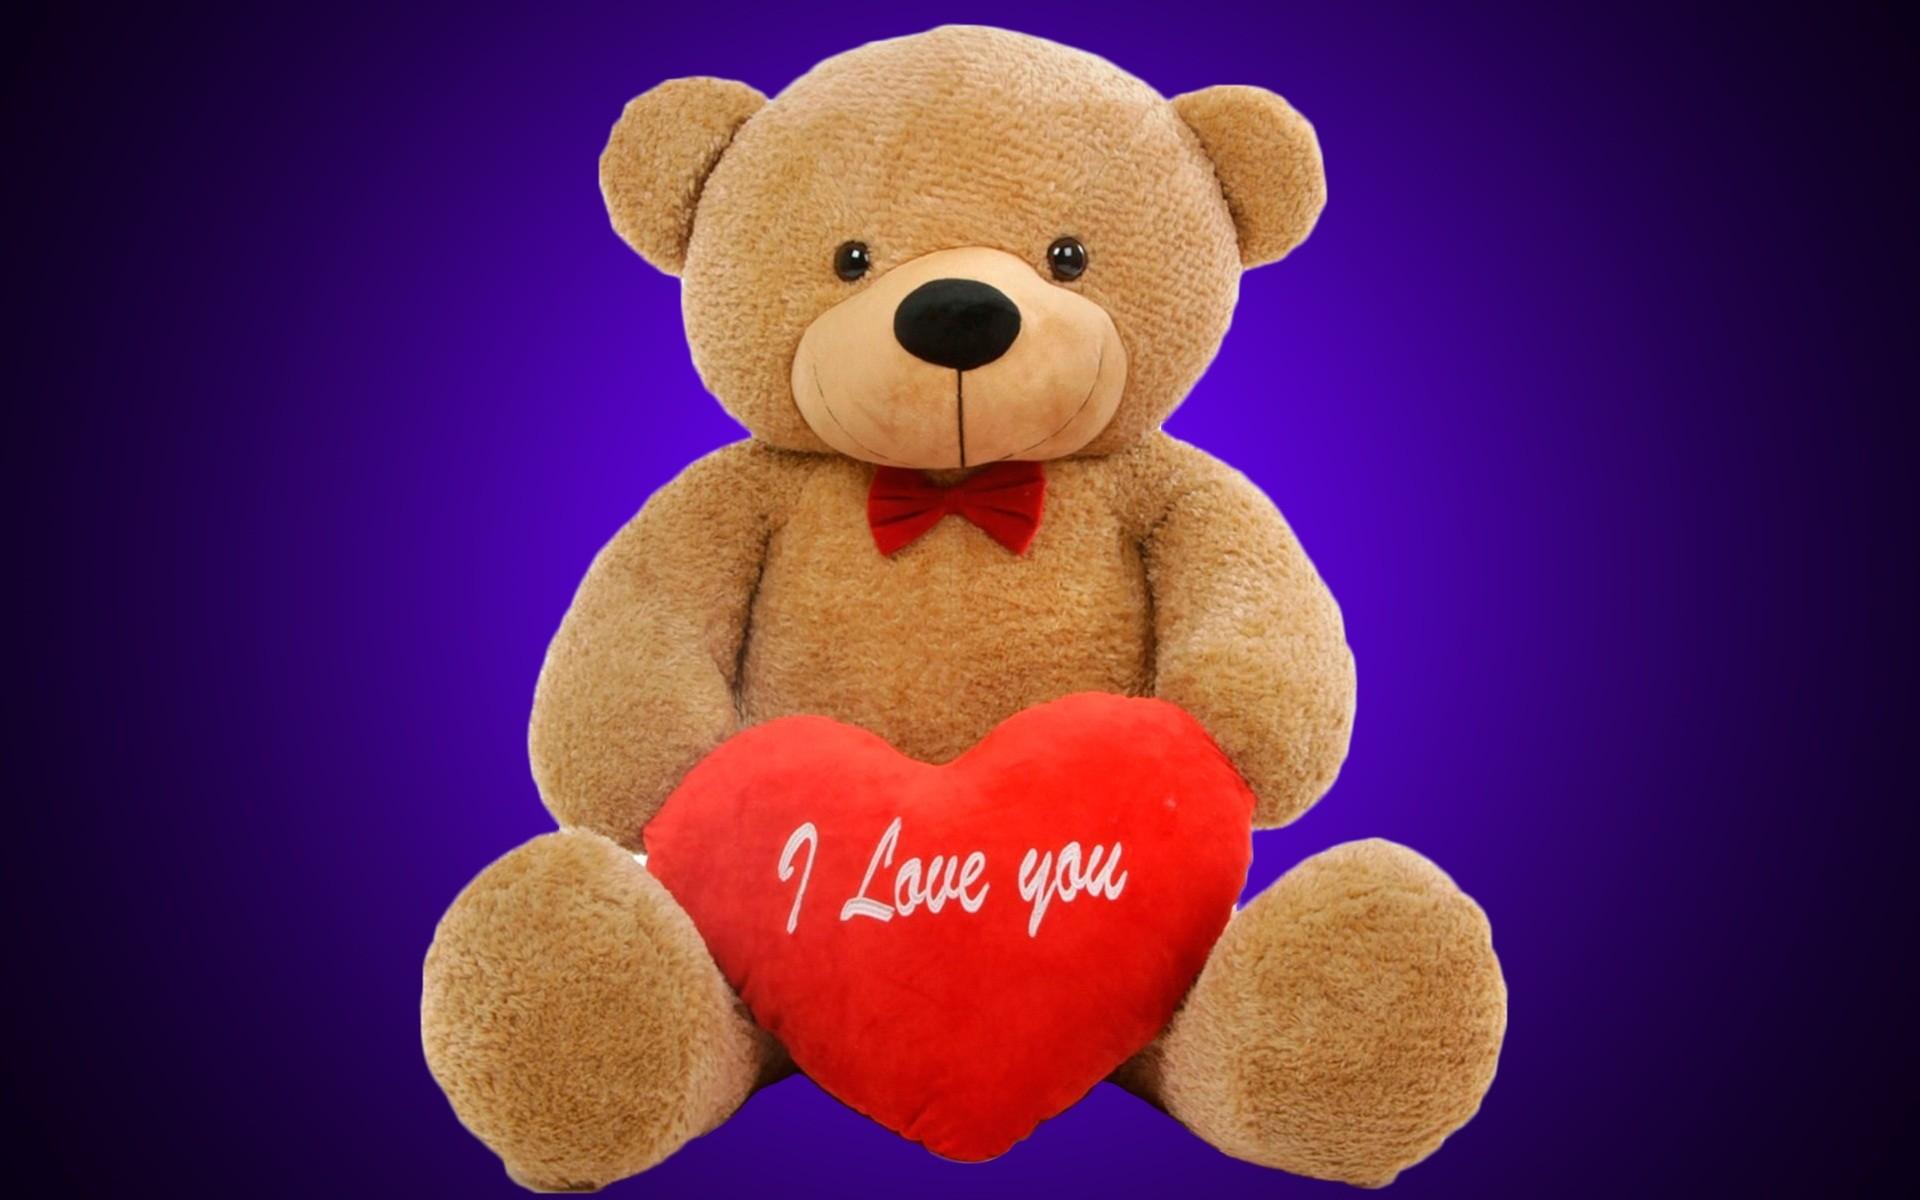 cute teddy bear wallpapers 183��